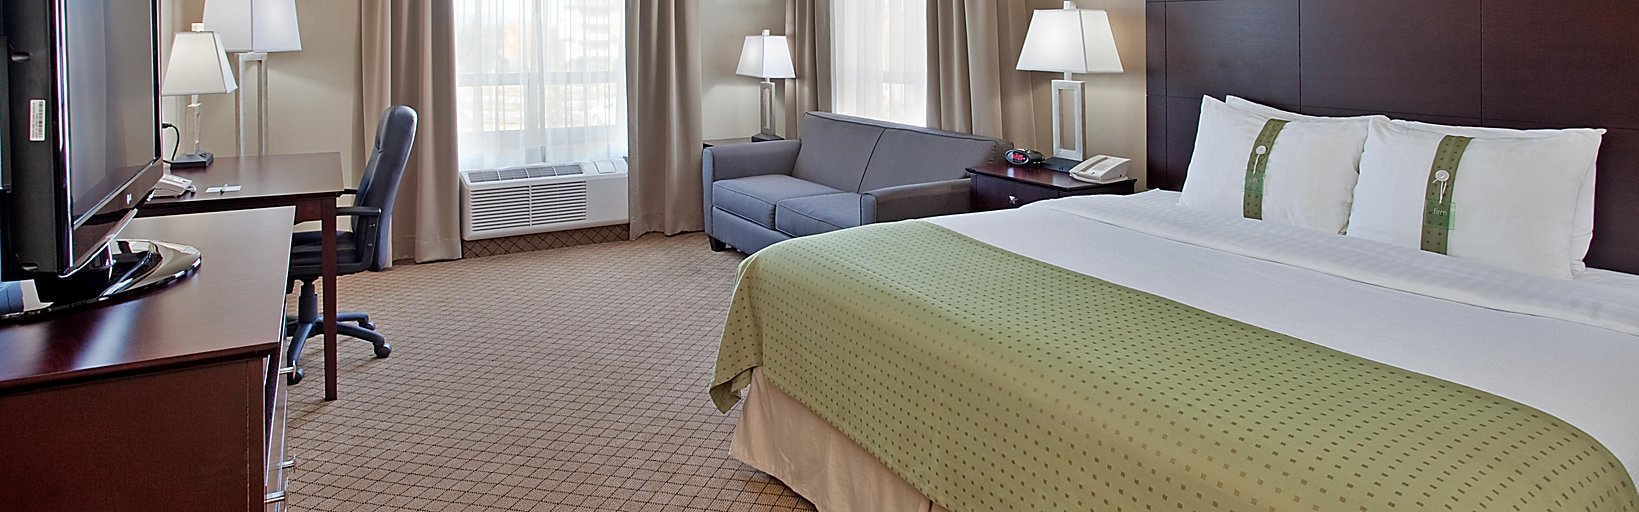 Surprising Holiday Inn Hotel Suites Kamloops Room Pictures Amenities Uwap Interior Chair Design Uwaporg